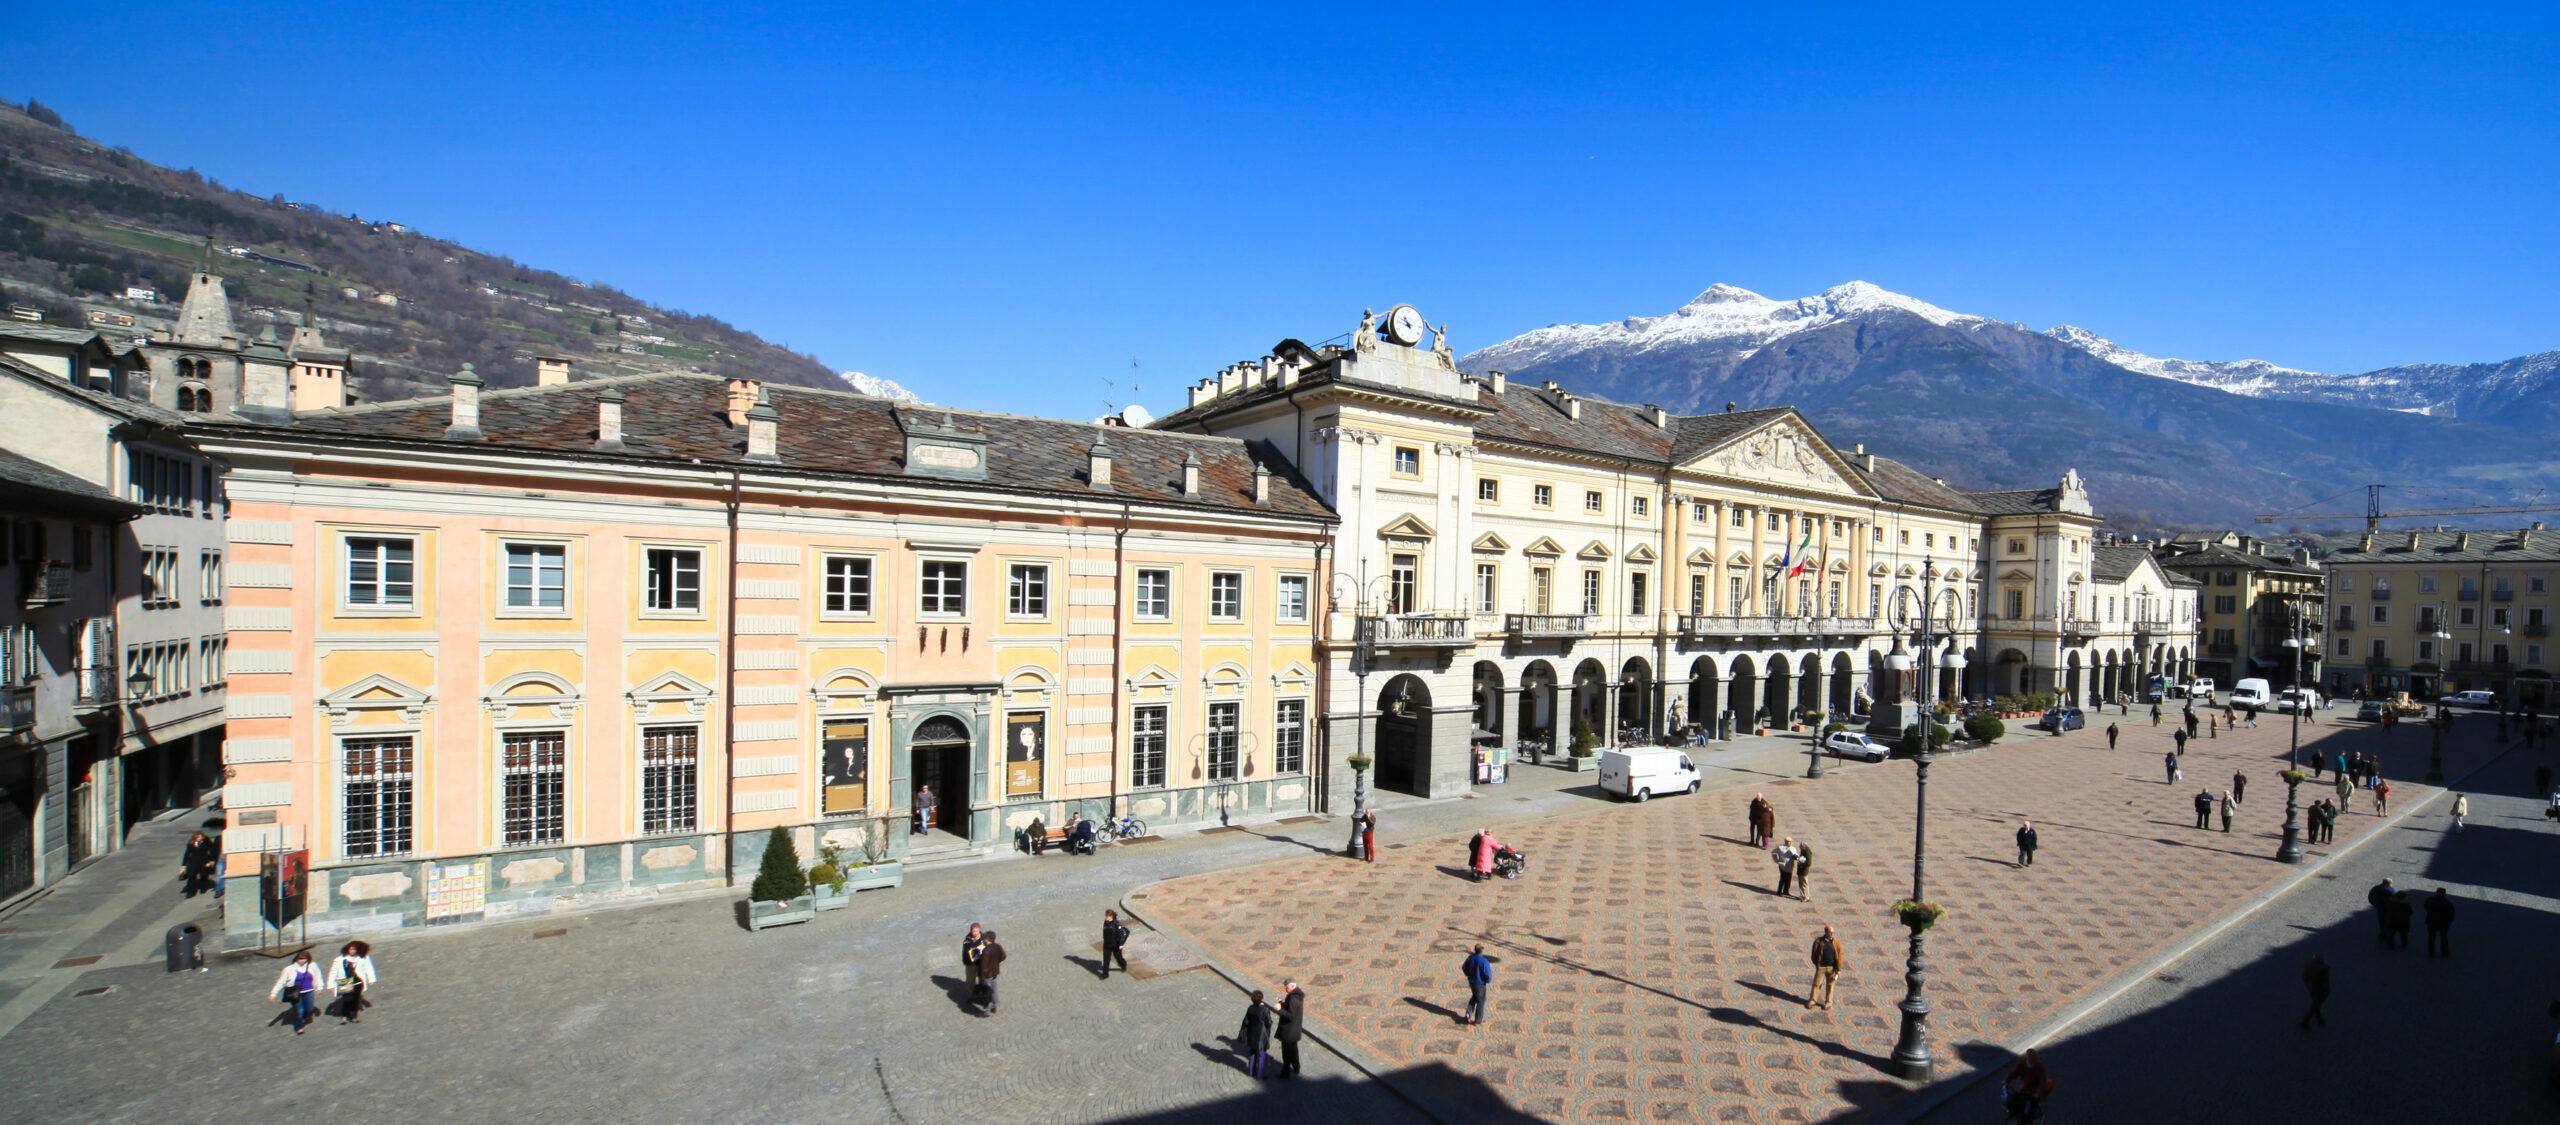 VALLE D'AOSTA-Aosta Piazza Chanoux (foto Enrico Romanzi)-1550 - Aigo